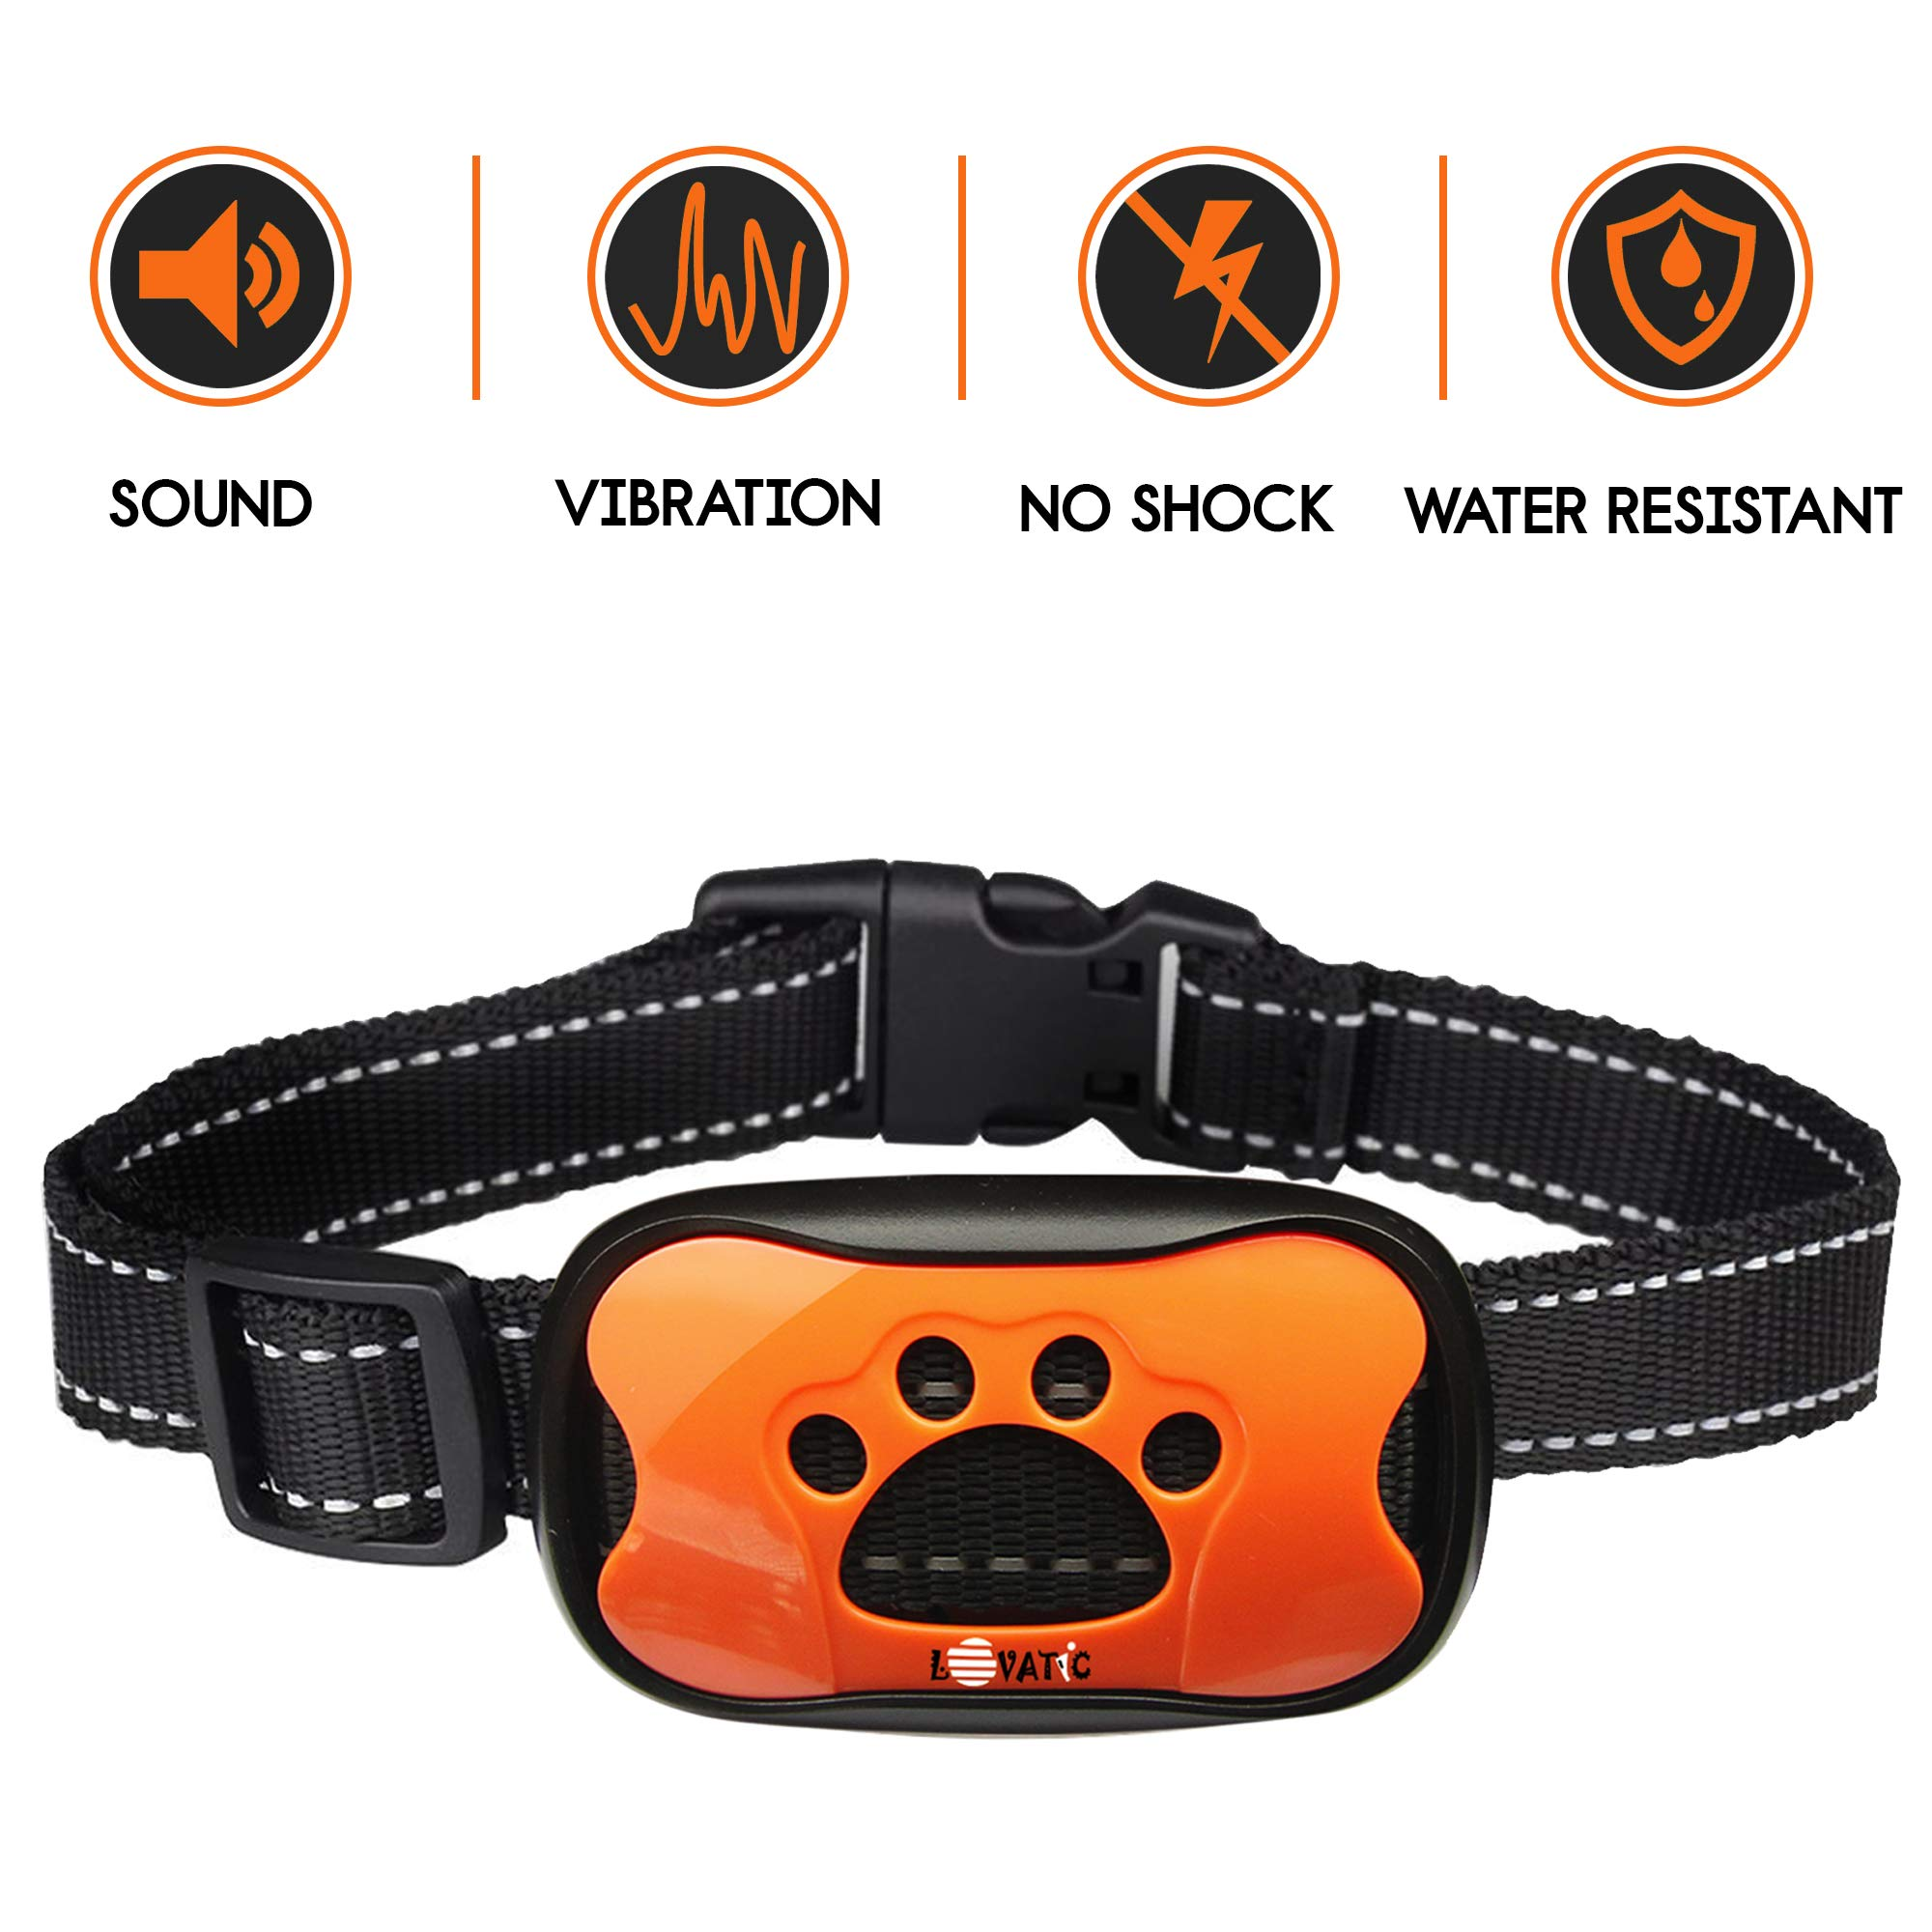 LOVATIC Dog Bark Collar - No Shock Vibration & Sound Humane Training Device for Small Medium Large Dogs - 7 Levels Sensitivity Adjustment - Best No Bark Control Collar